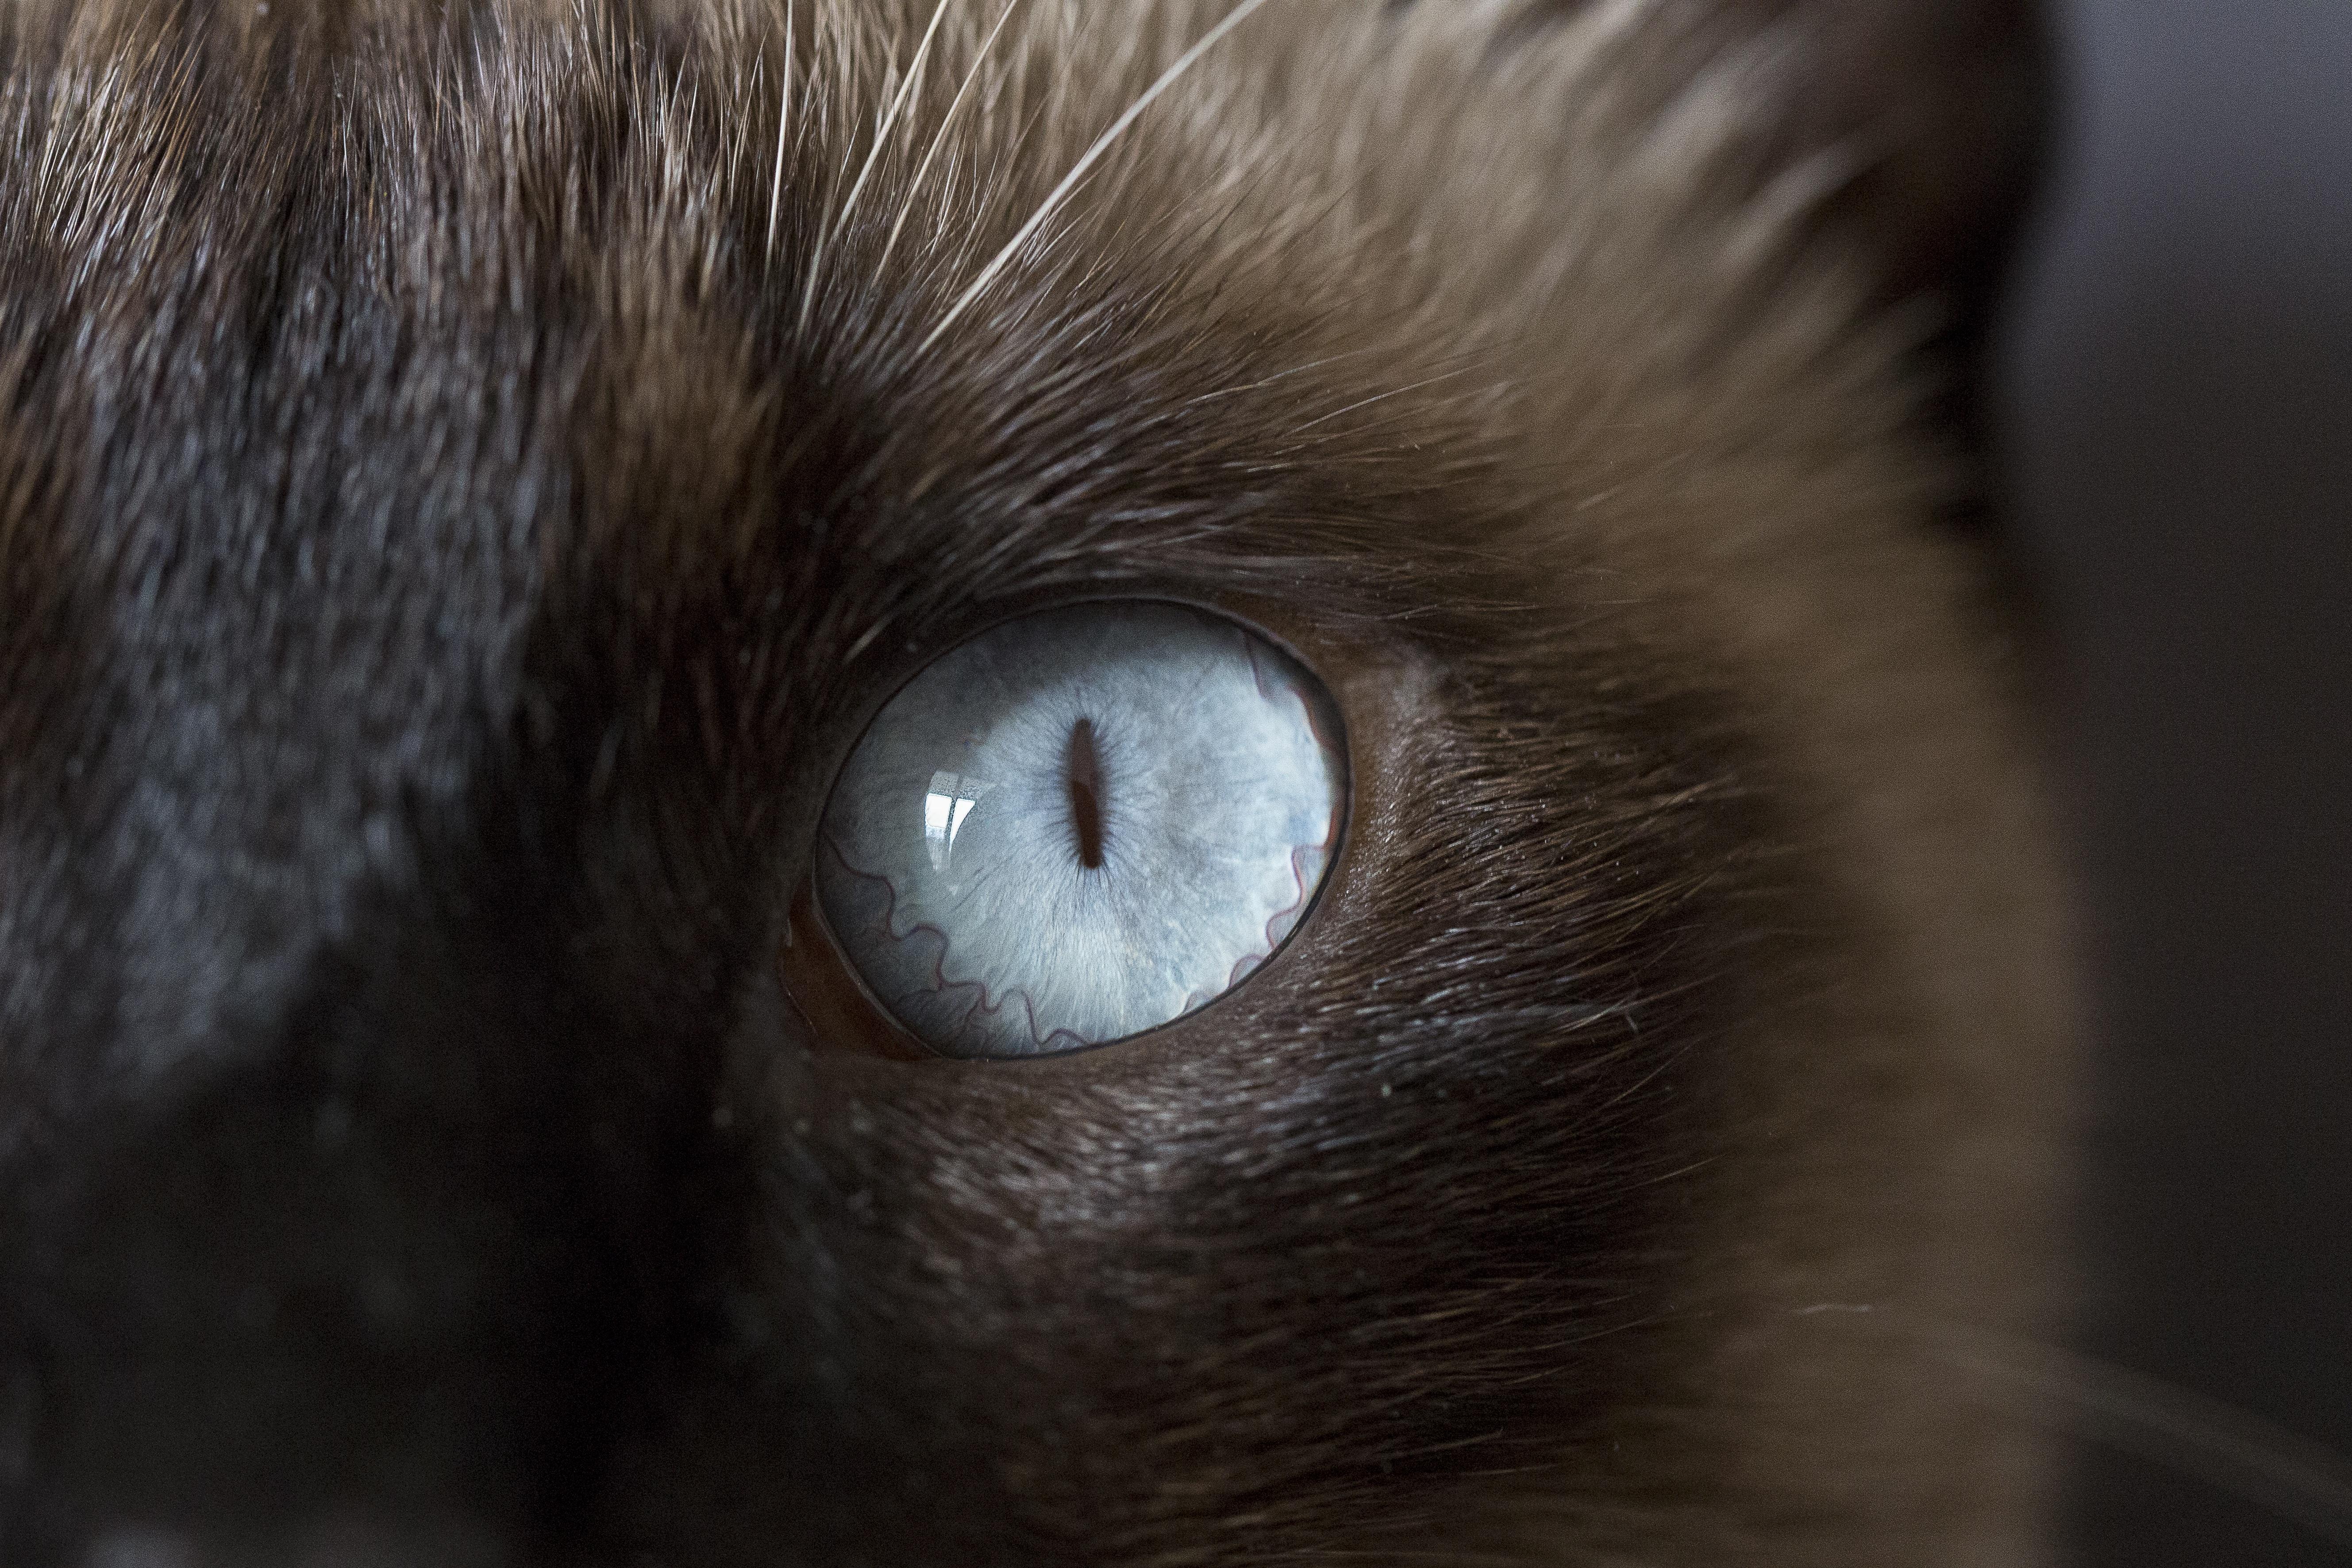 кошачьи глаза у людей картинки